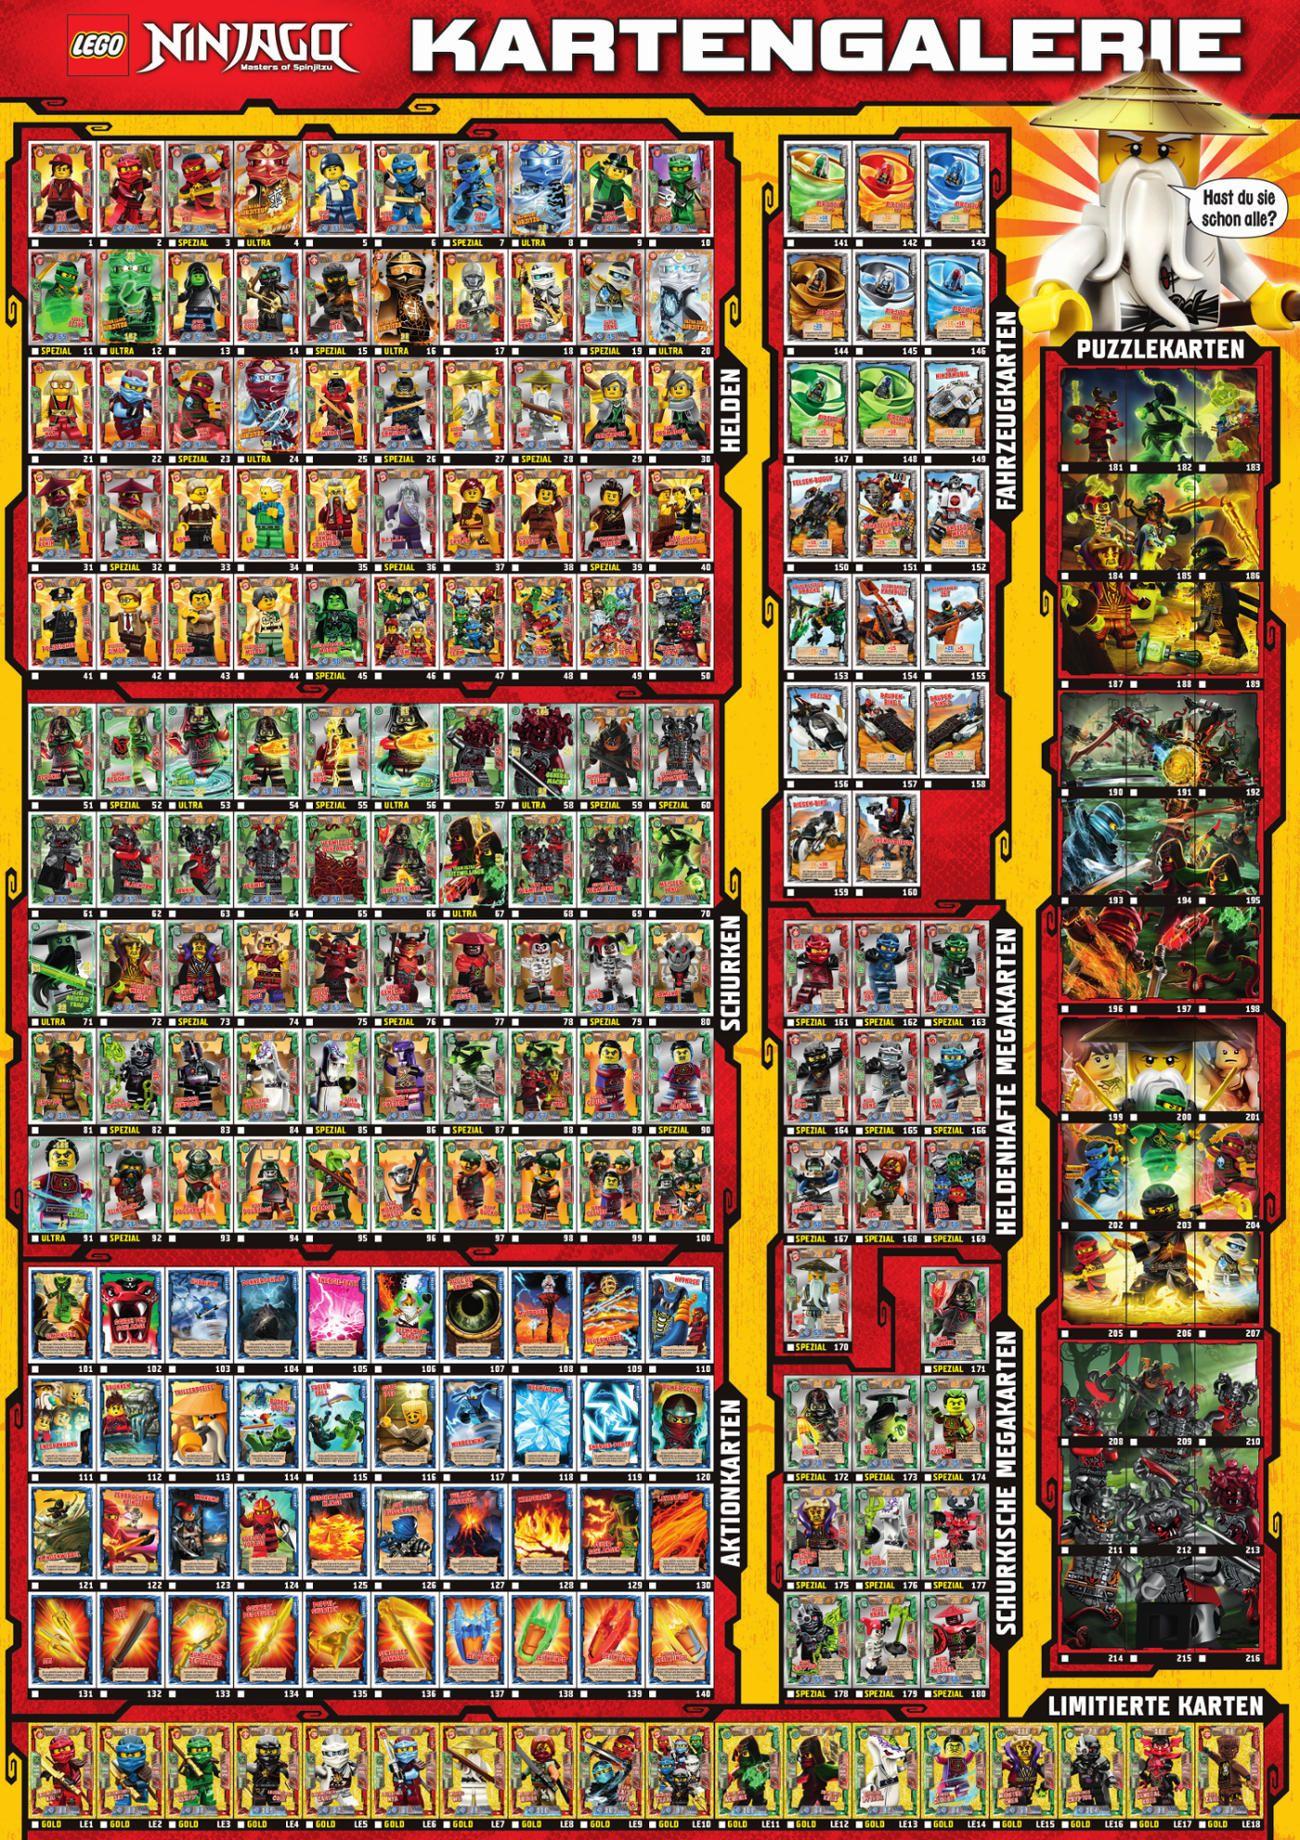 Lego Ninjago Serie 5 Sammelkarten Kaufen Ninjago Trading Cards Lego Ninjago Lego Ninjago